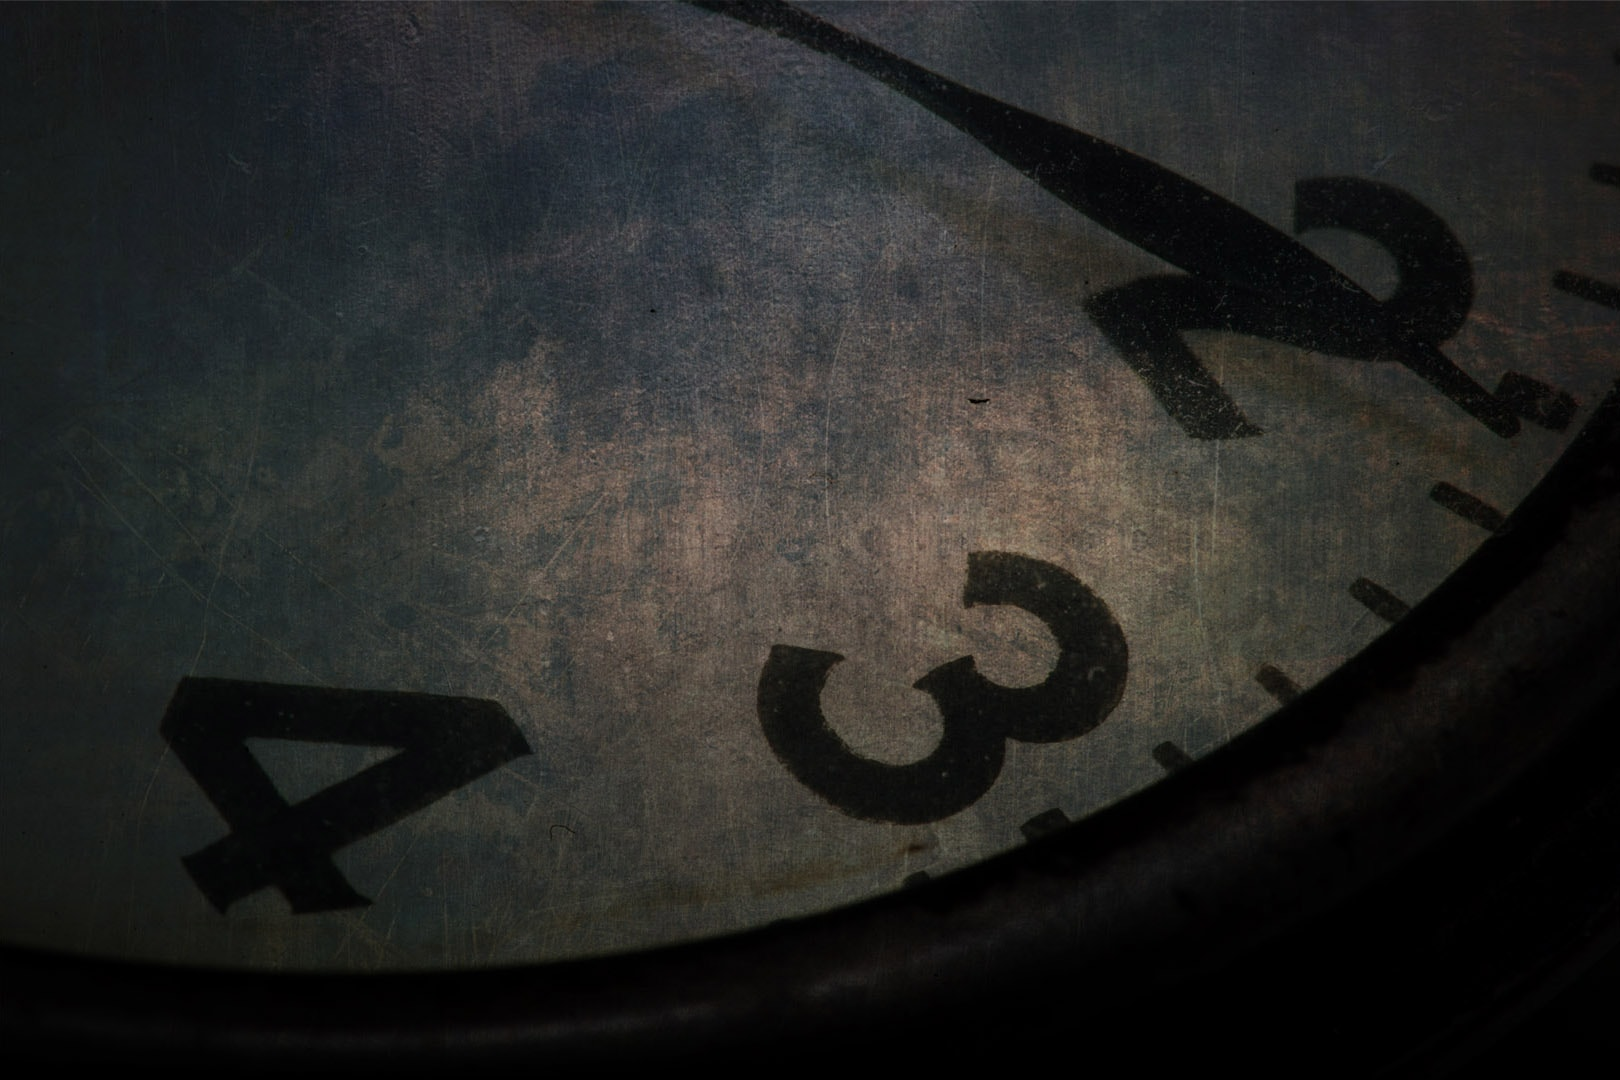 Still Life Photography, Clock Detail